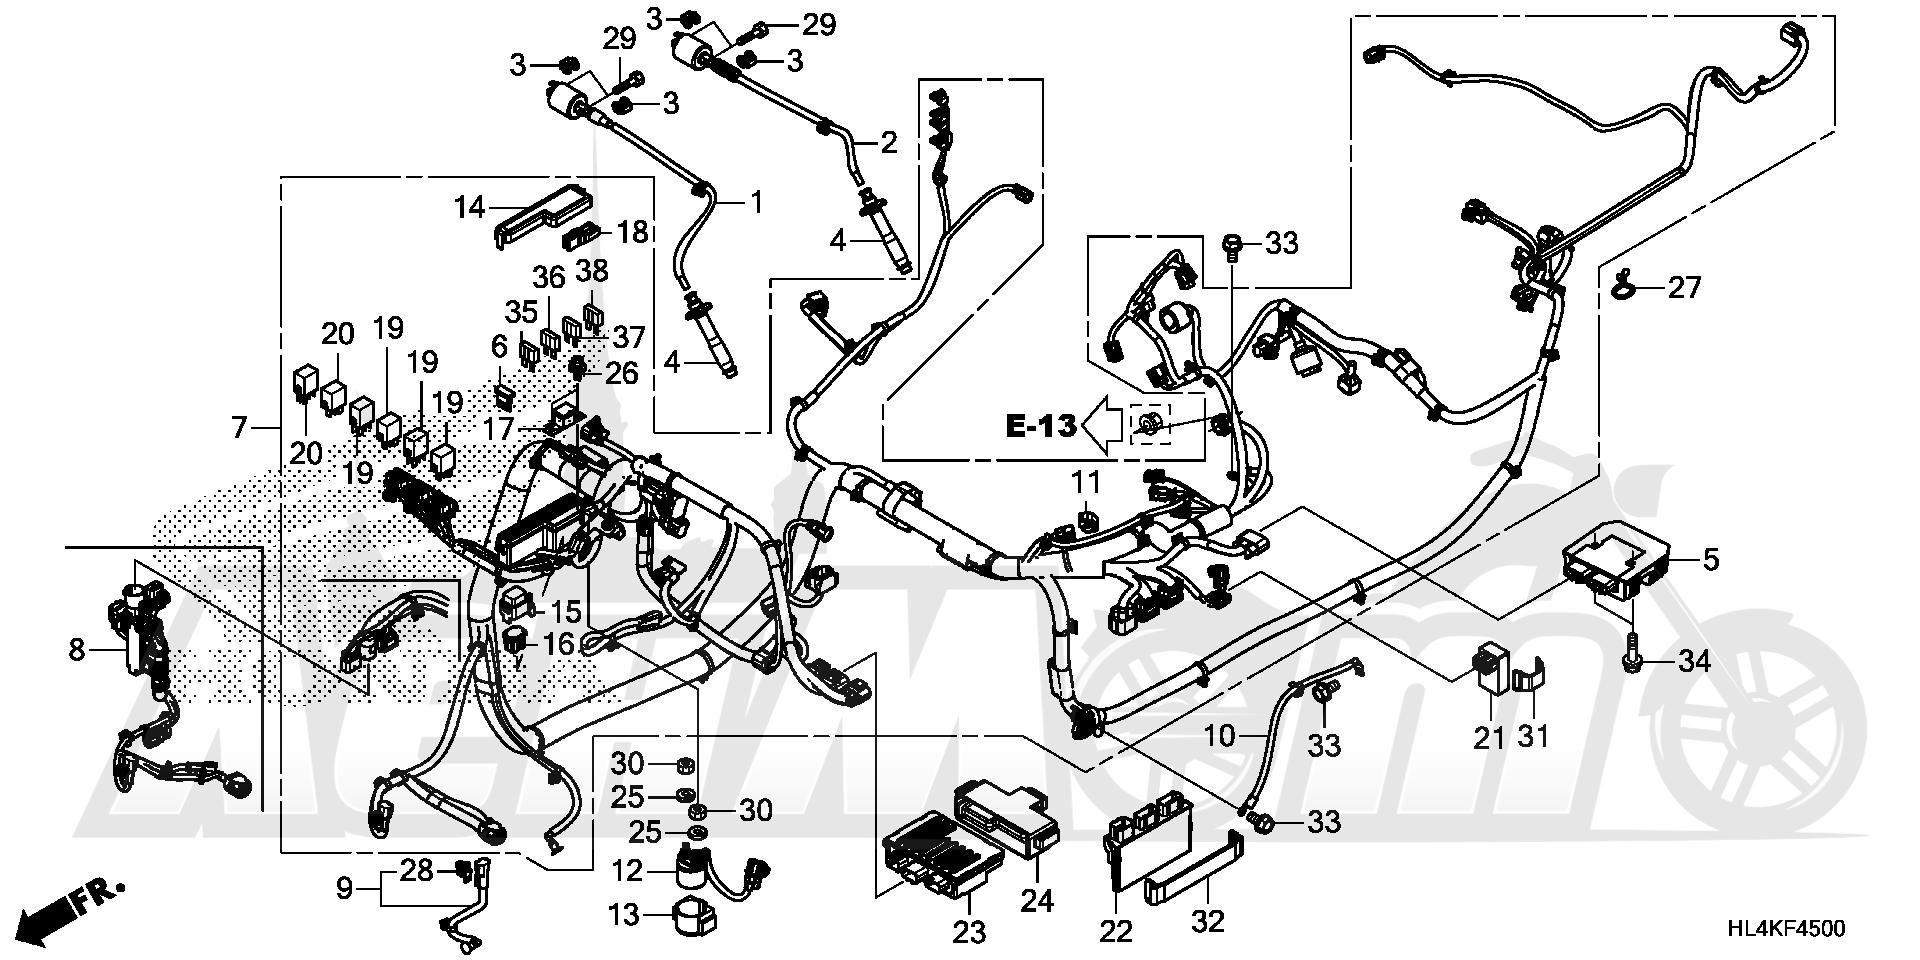 Запчасти для Квадроцикла Honda 2019 SXS1000M5D Раздел: WIRE HARNESS | жгут проводов